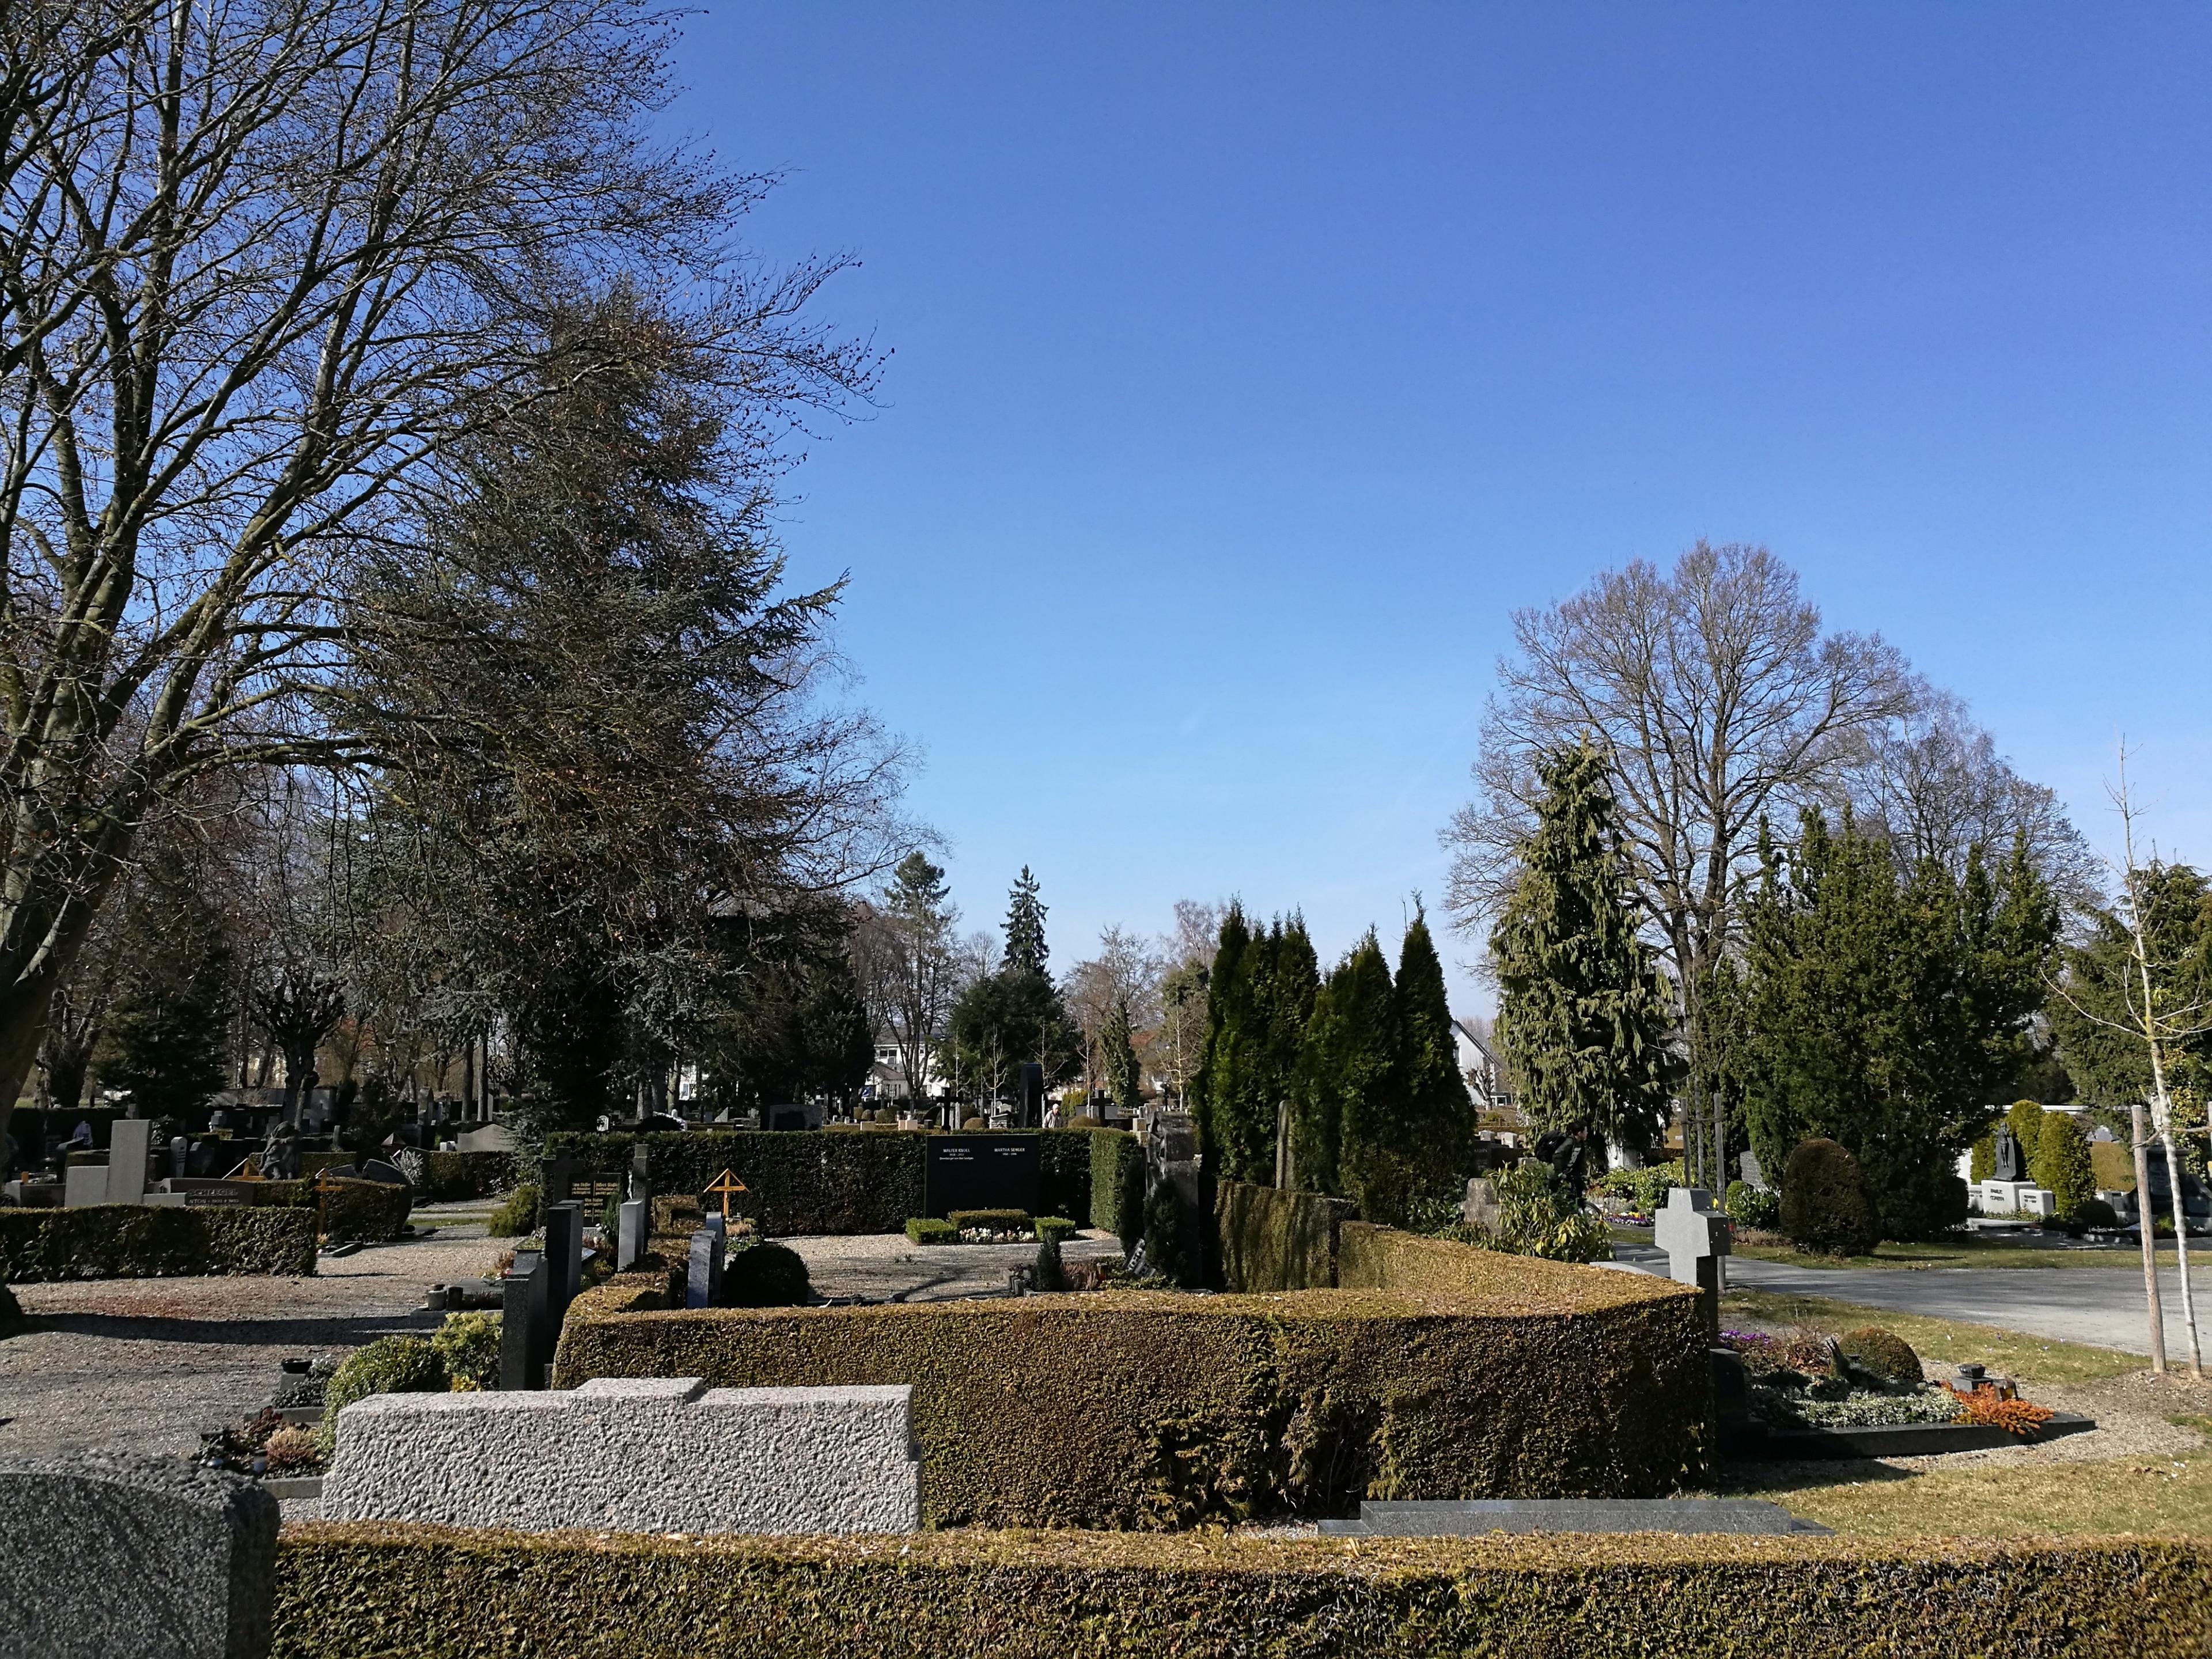 Bad Saulgau, Baden-Württemberg, Germany